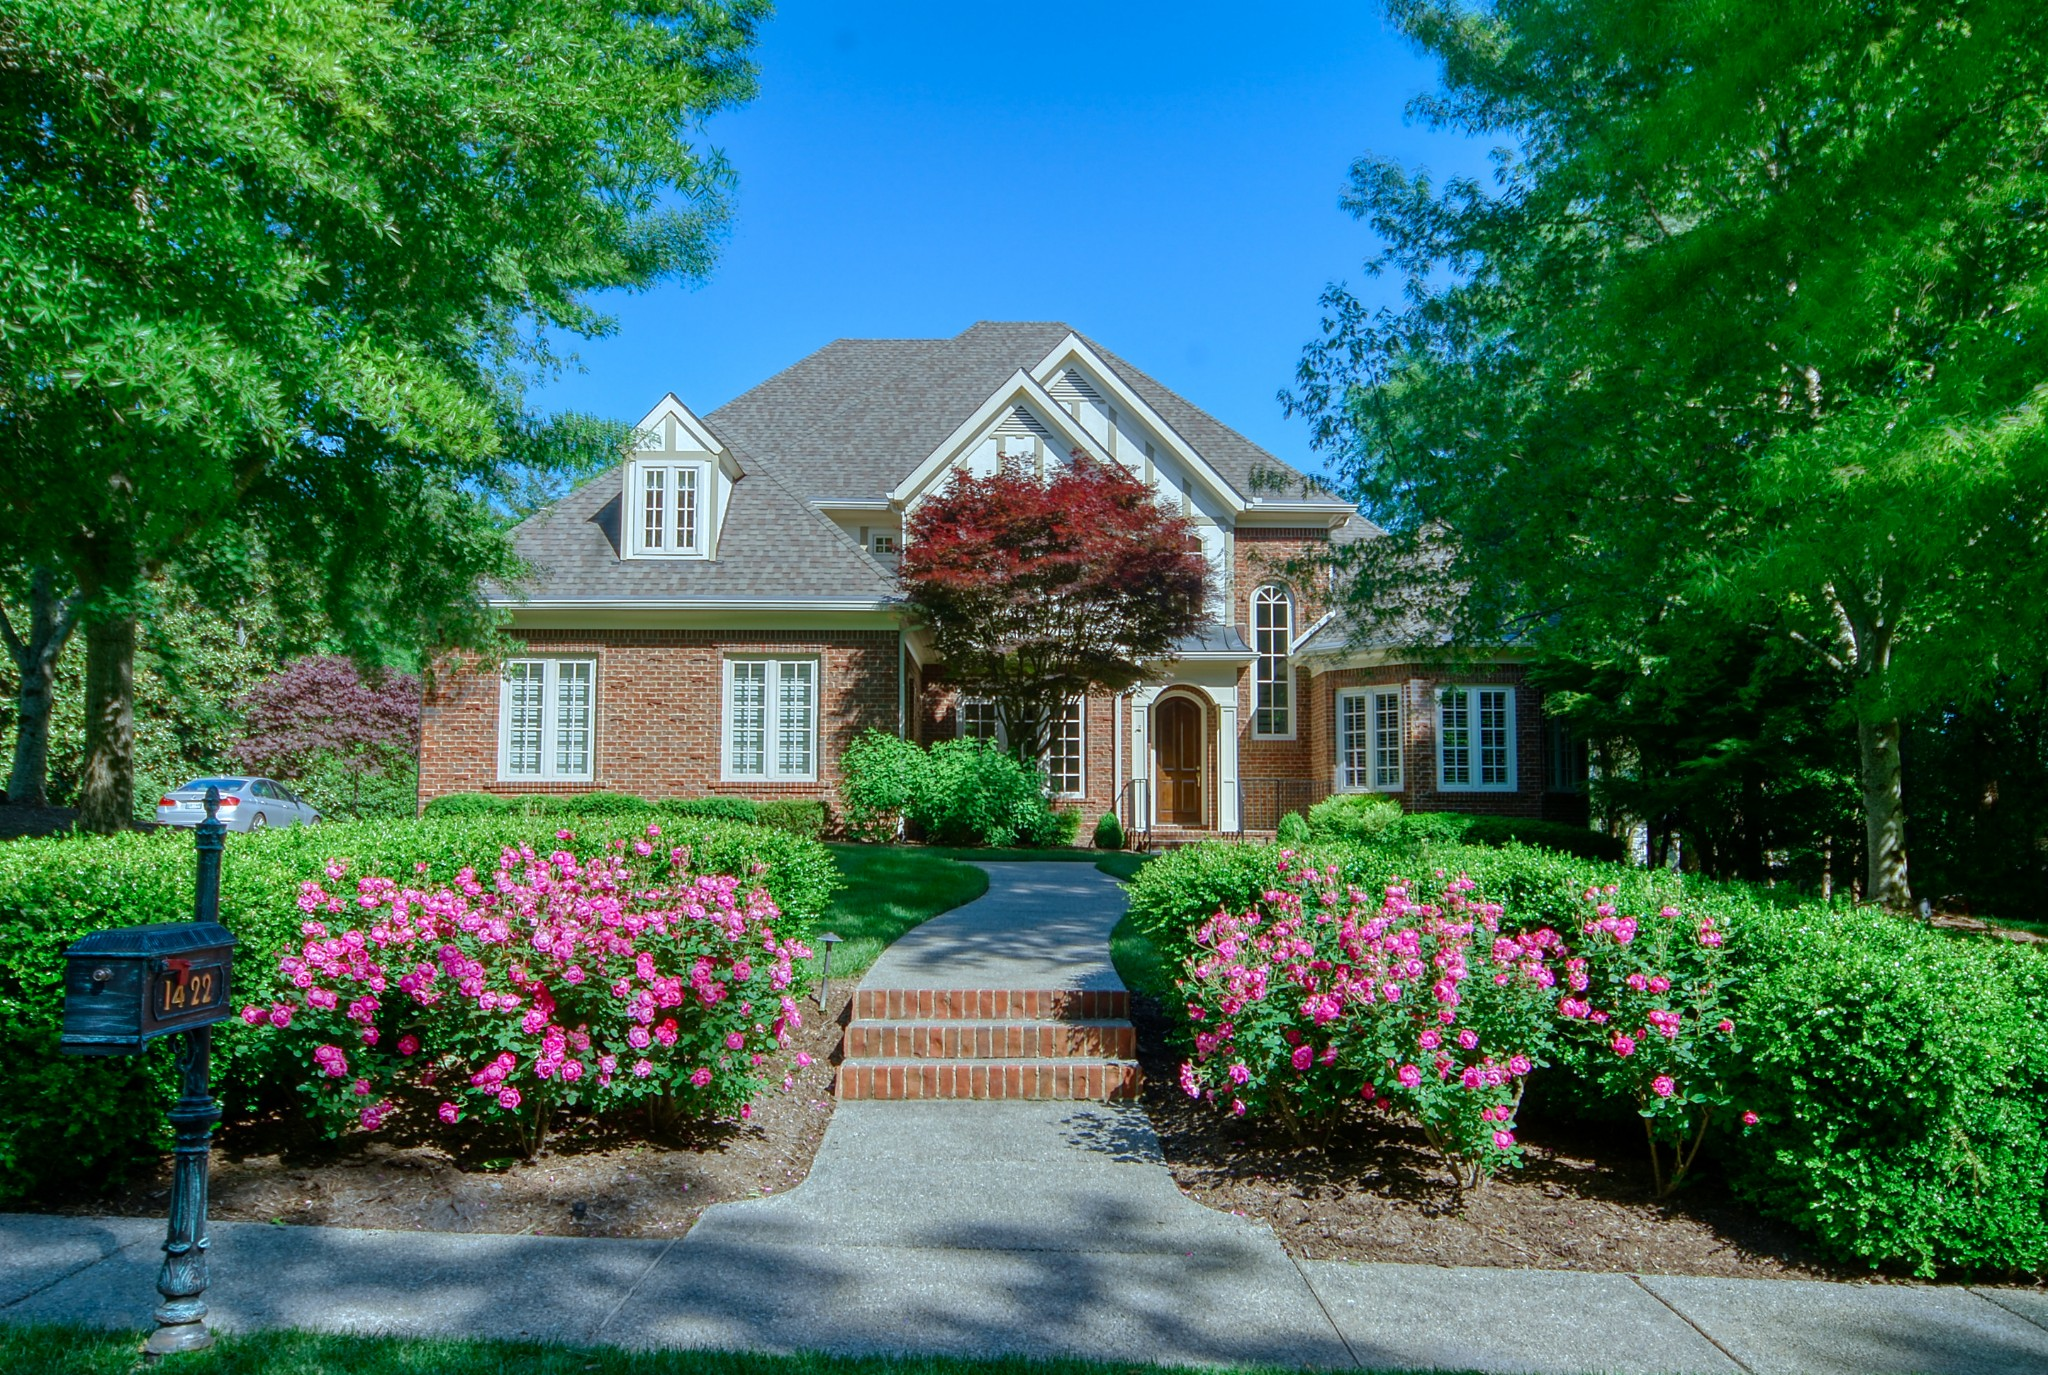 1422 Willowbrooke Cir Property Photo - Franklin, TN real estate listing